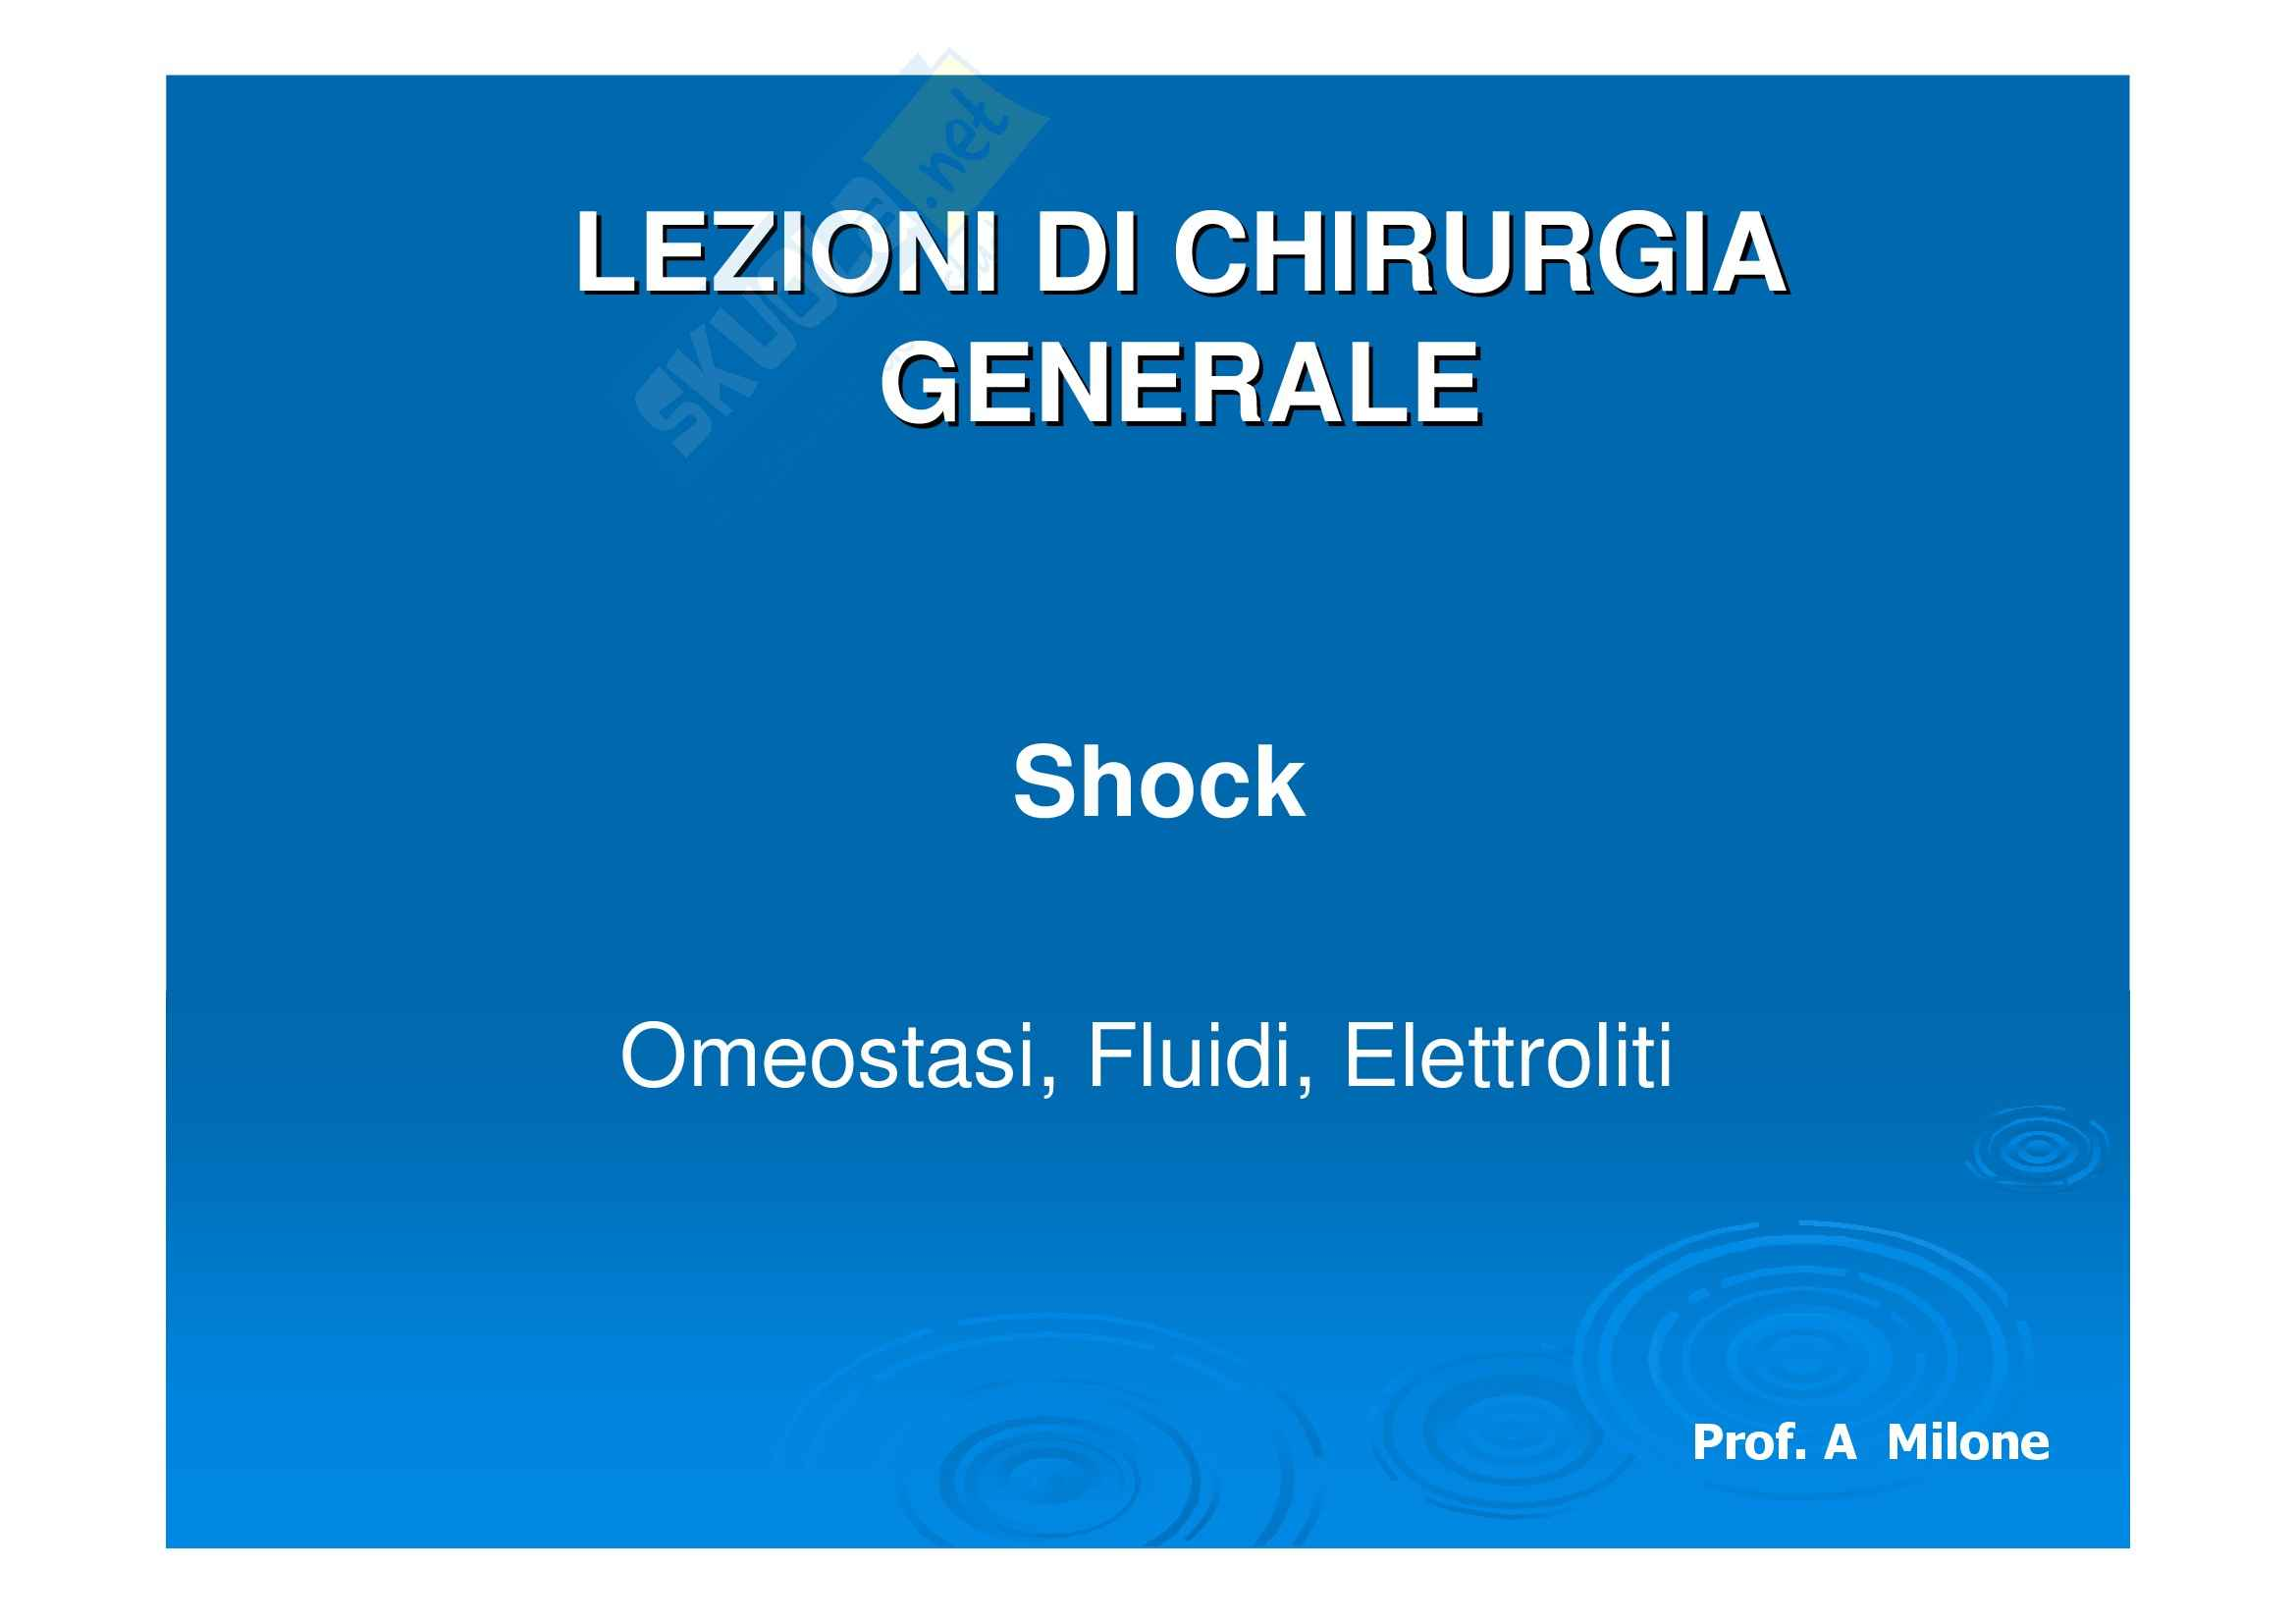 Chirurgia generale - lo shock: omeostasi, fluidi, elettrolisi